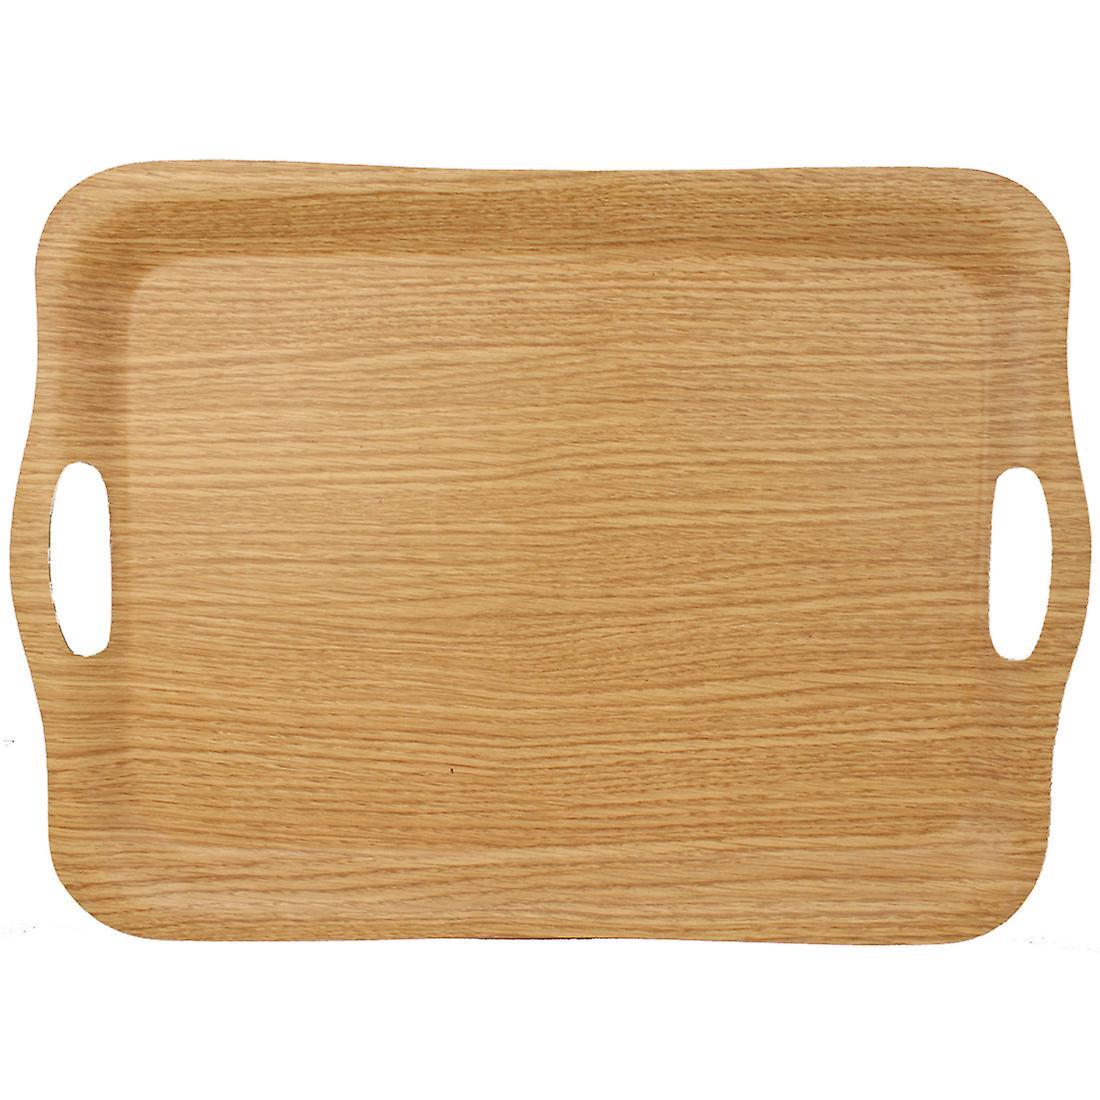 Non-Slip Tray - Large